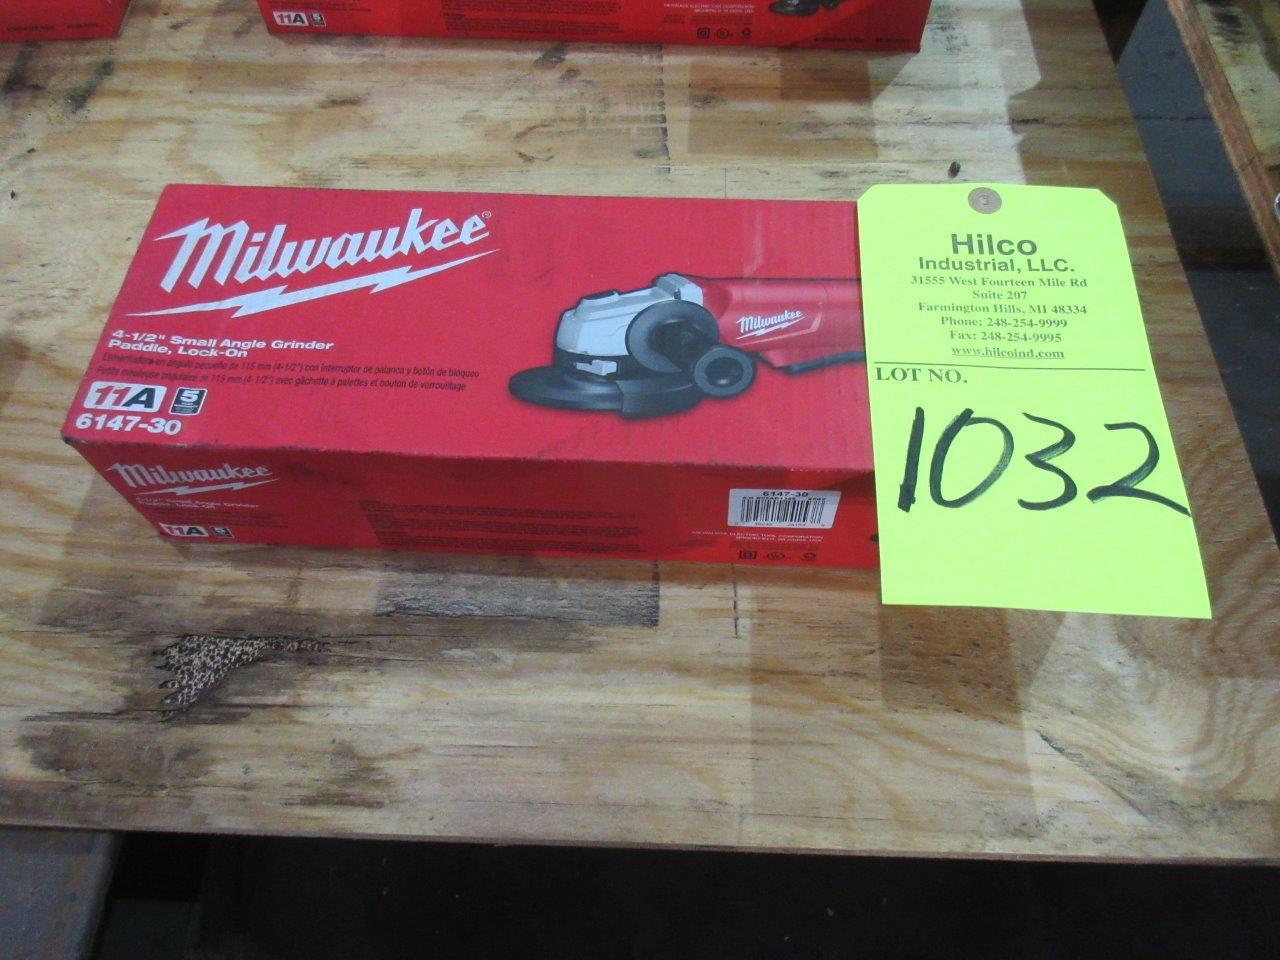 "Lot 1032 - Milwaukee Cat # 6147-30 New 4 1/2"" Angle Grinder"